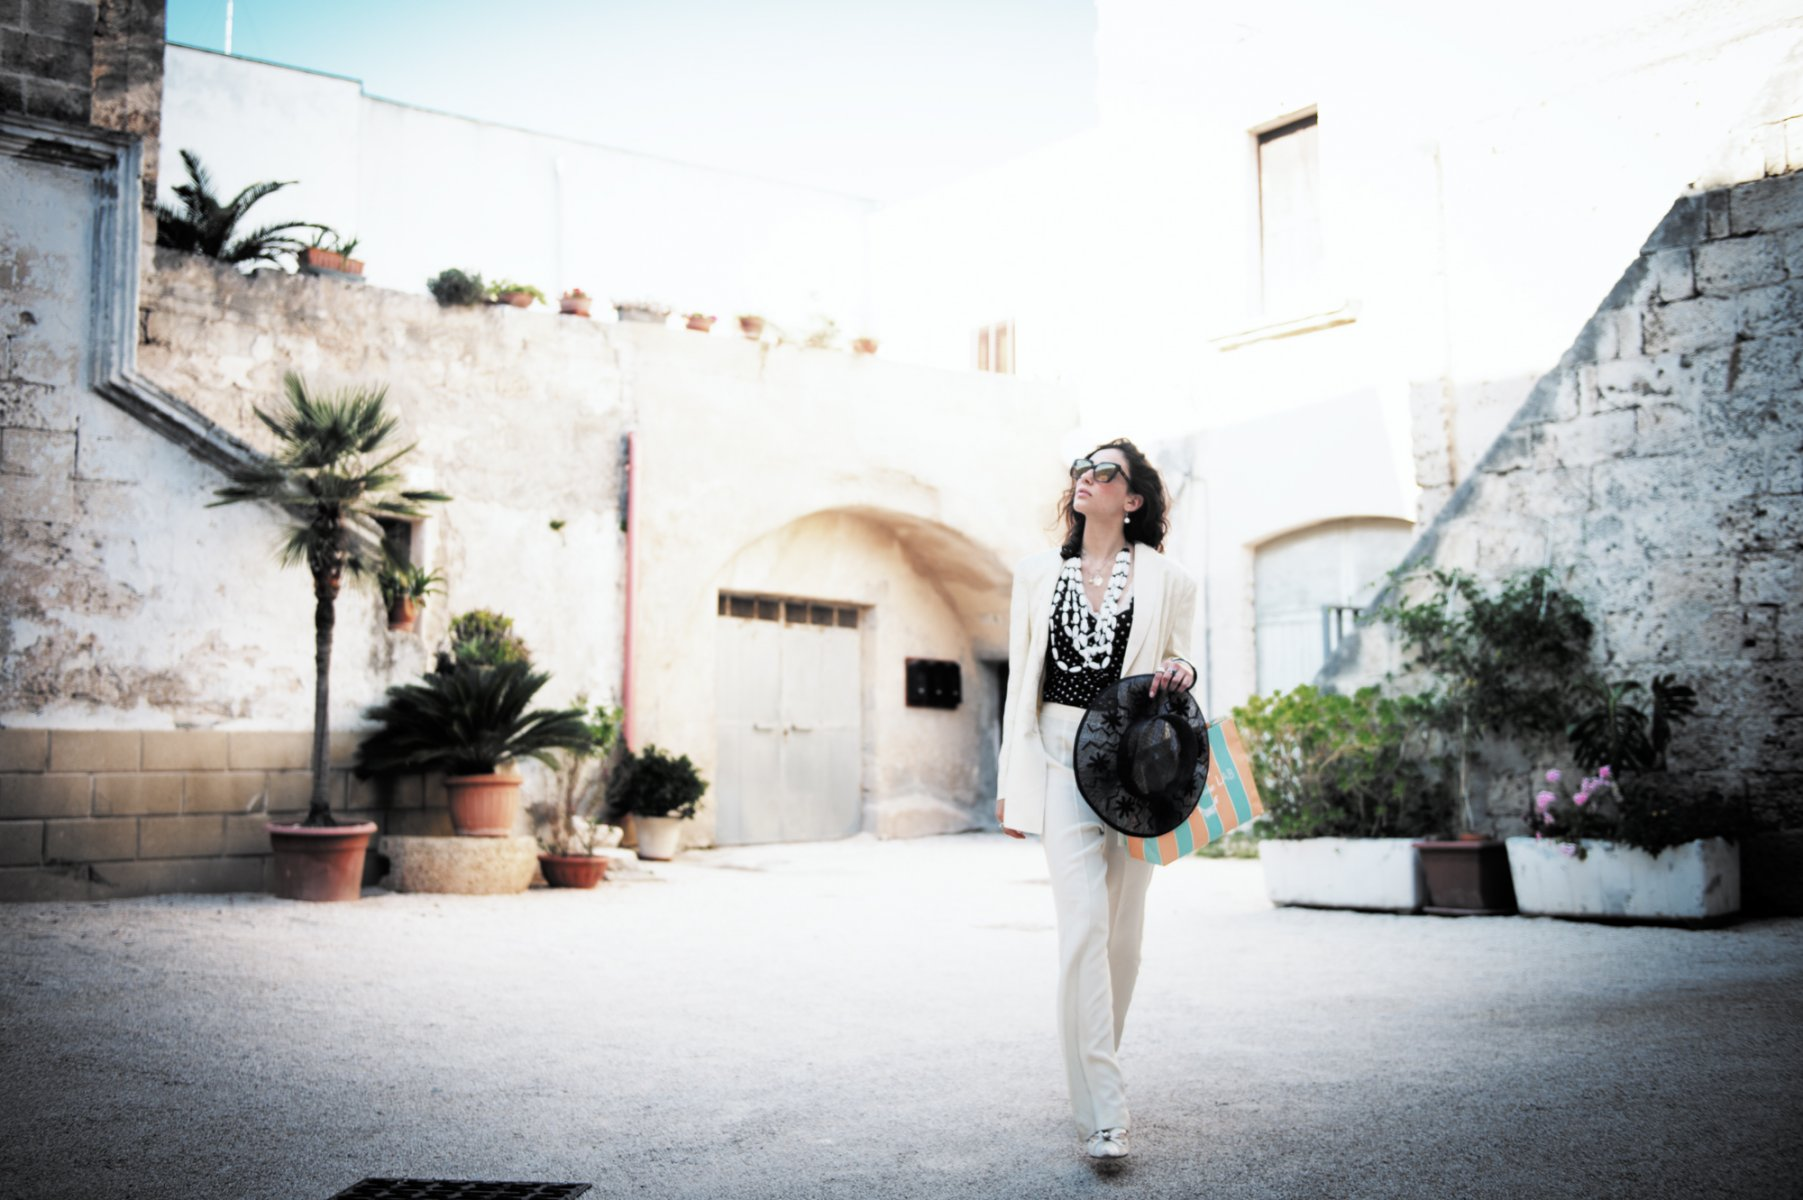 165-Pretty_Woman_MMD9417 Fashion/Adv